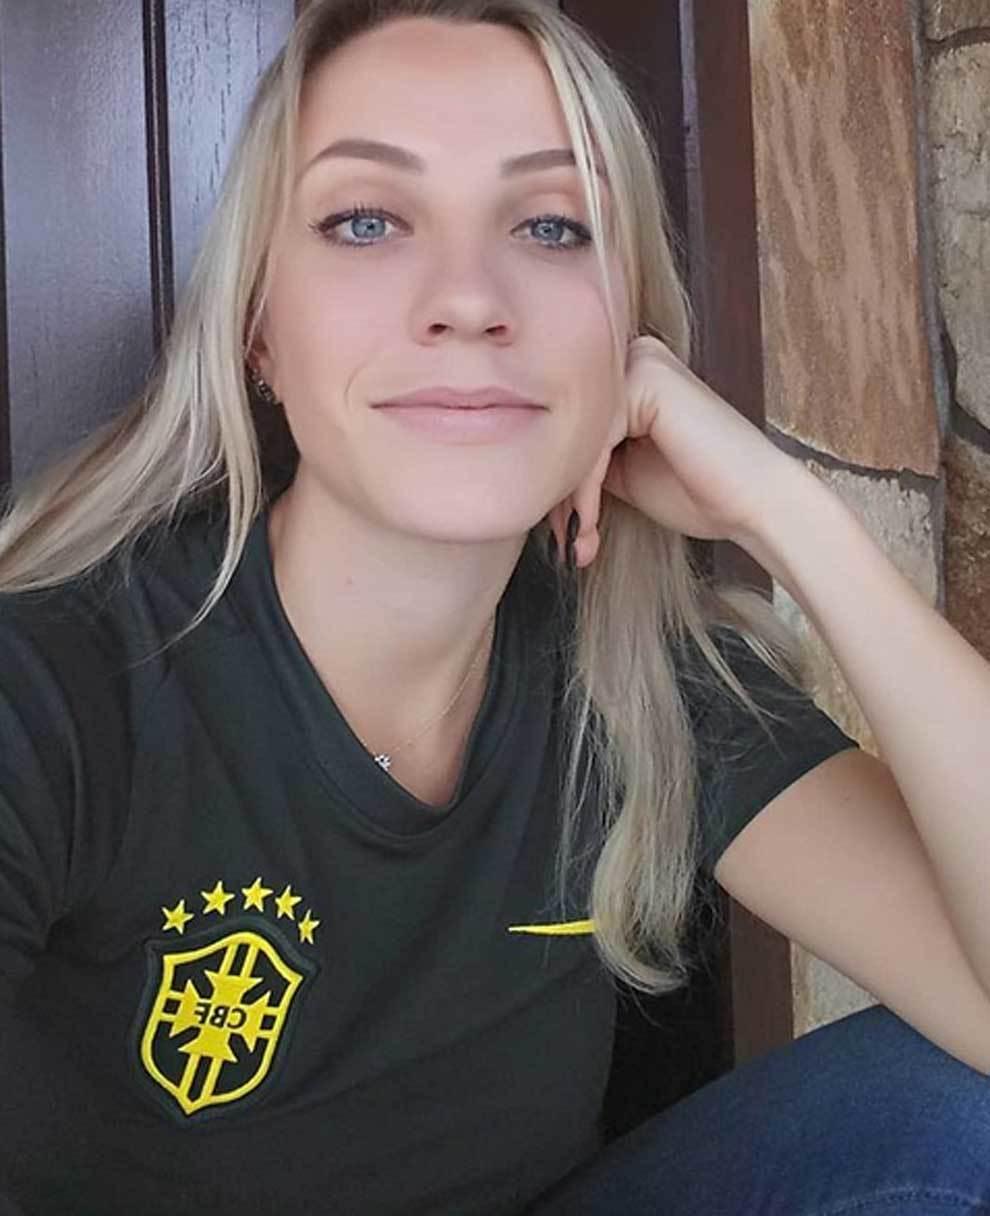 The personal album of popular Brazilian referee Fernanda Colombo - Foto 19  de 23 | MARCA English